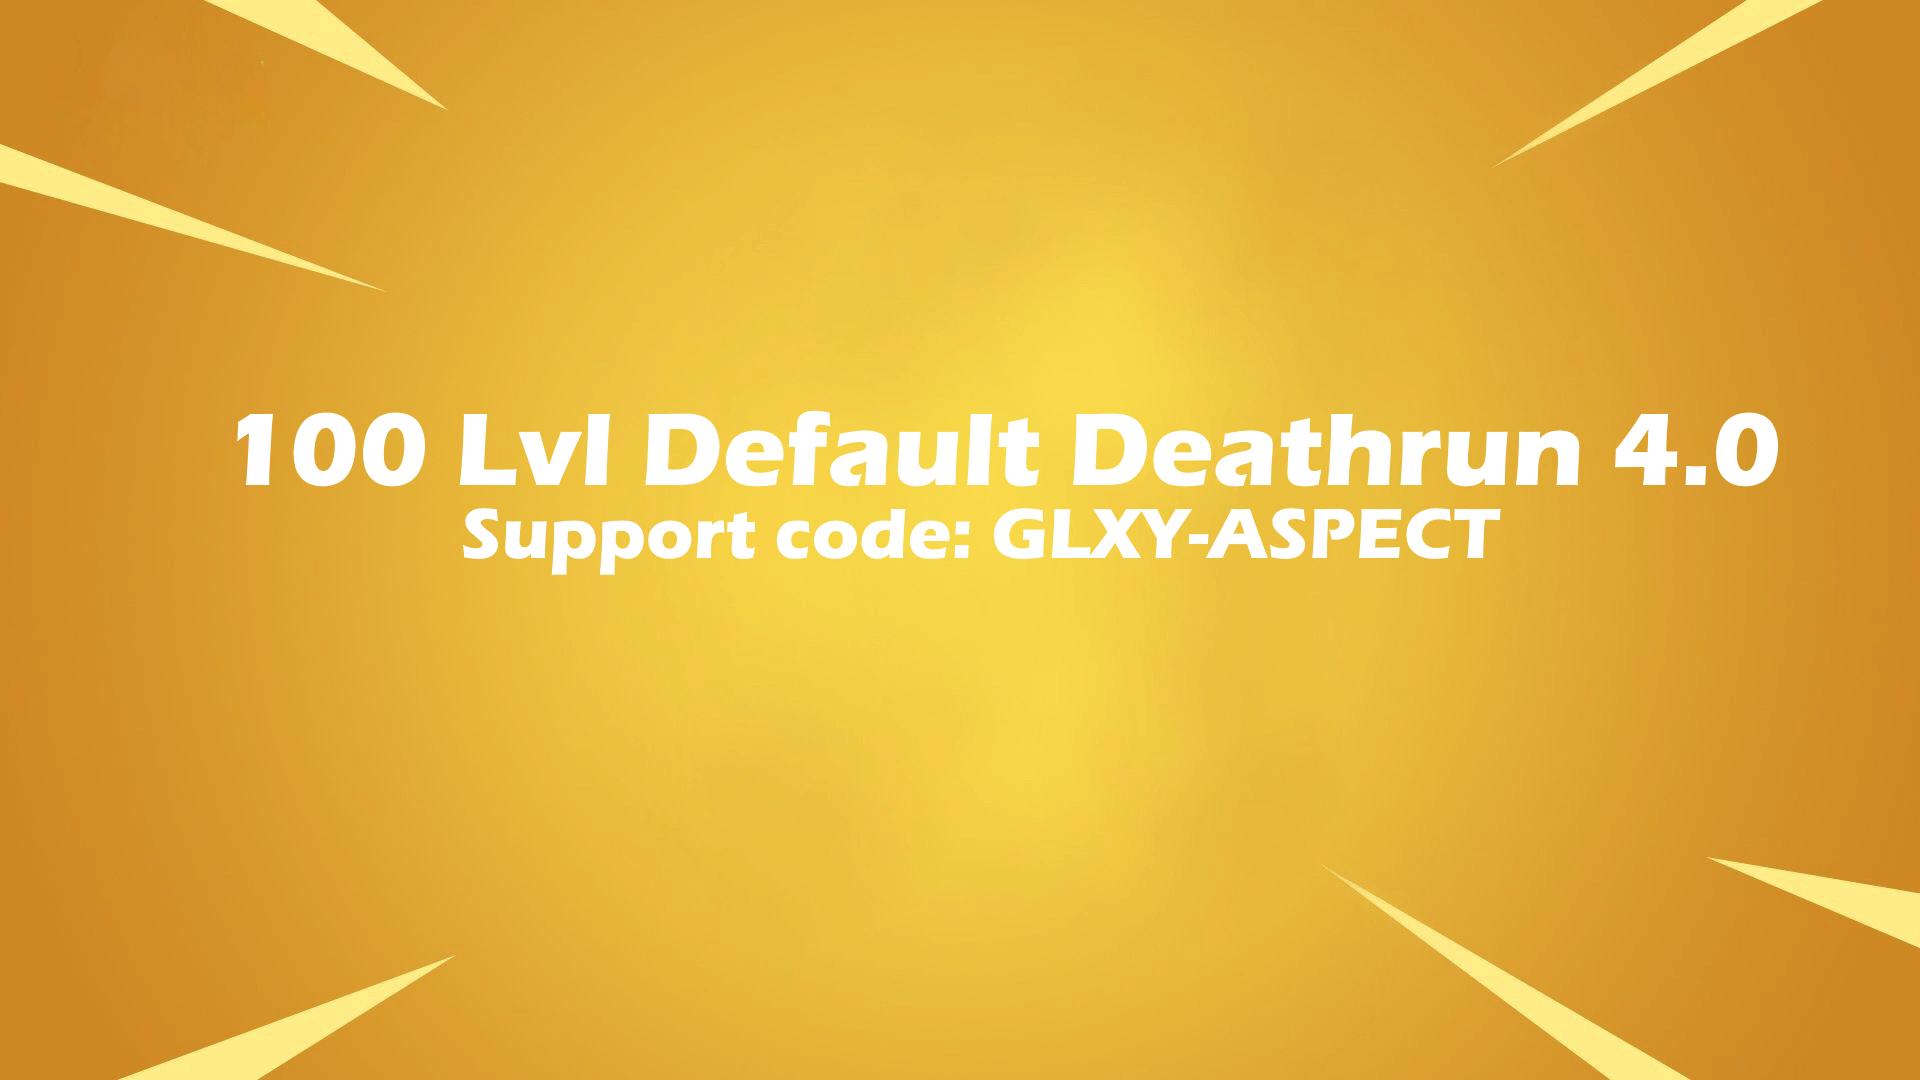 100 LVL DEFAULT DEATHRUN 4 0 - Fortnite Creative Codes